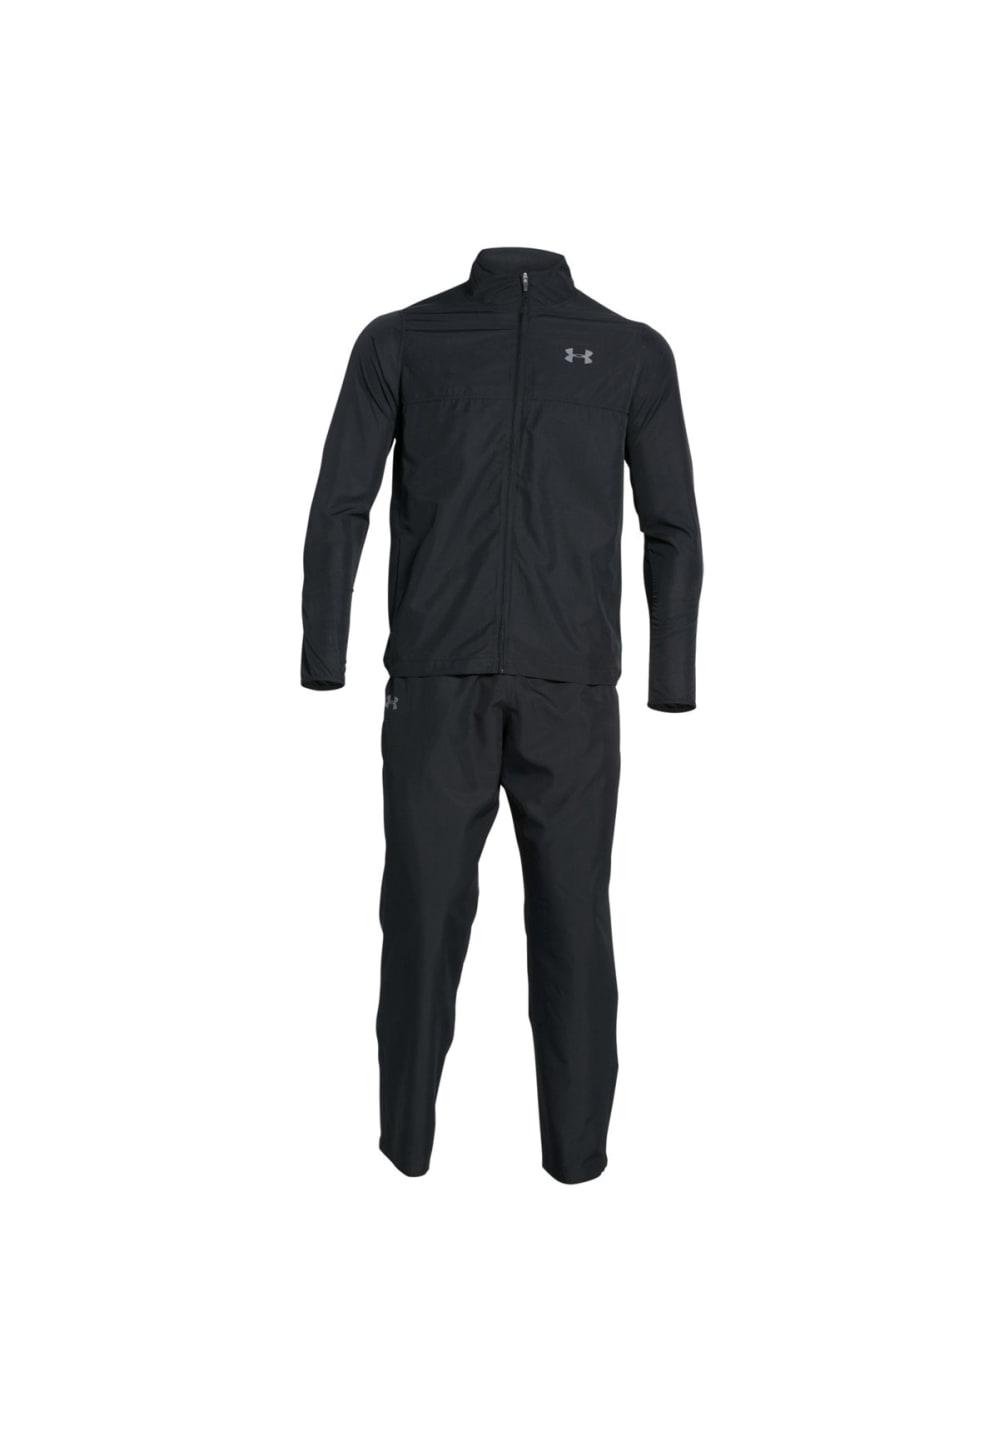 trainingsanzug anzug f r under armour preisvergleiche. Black Bedroom Furniture Sets. Home Design Ideas